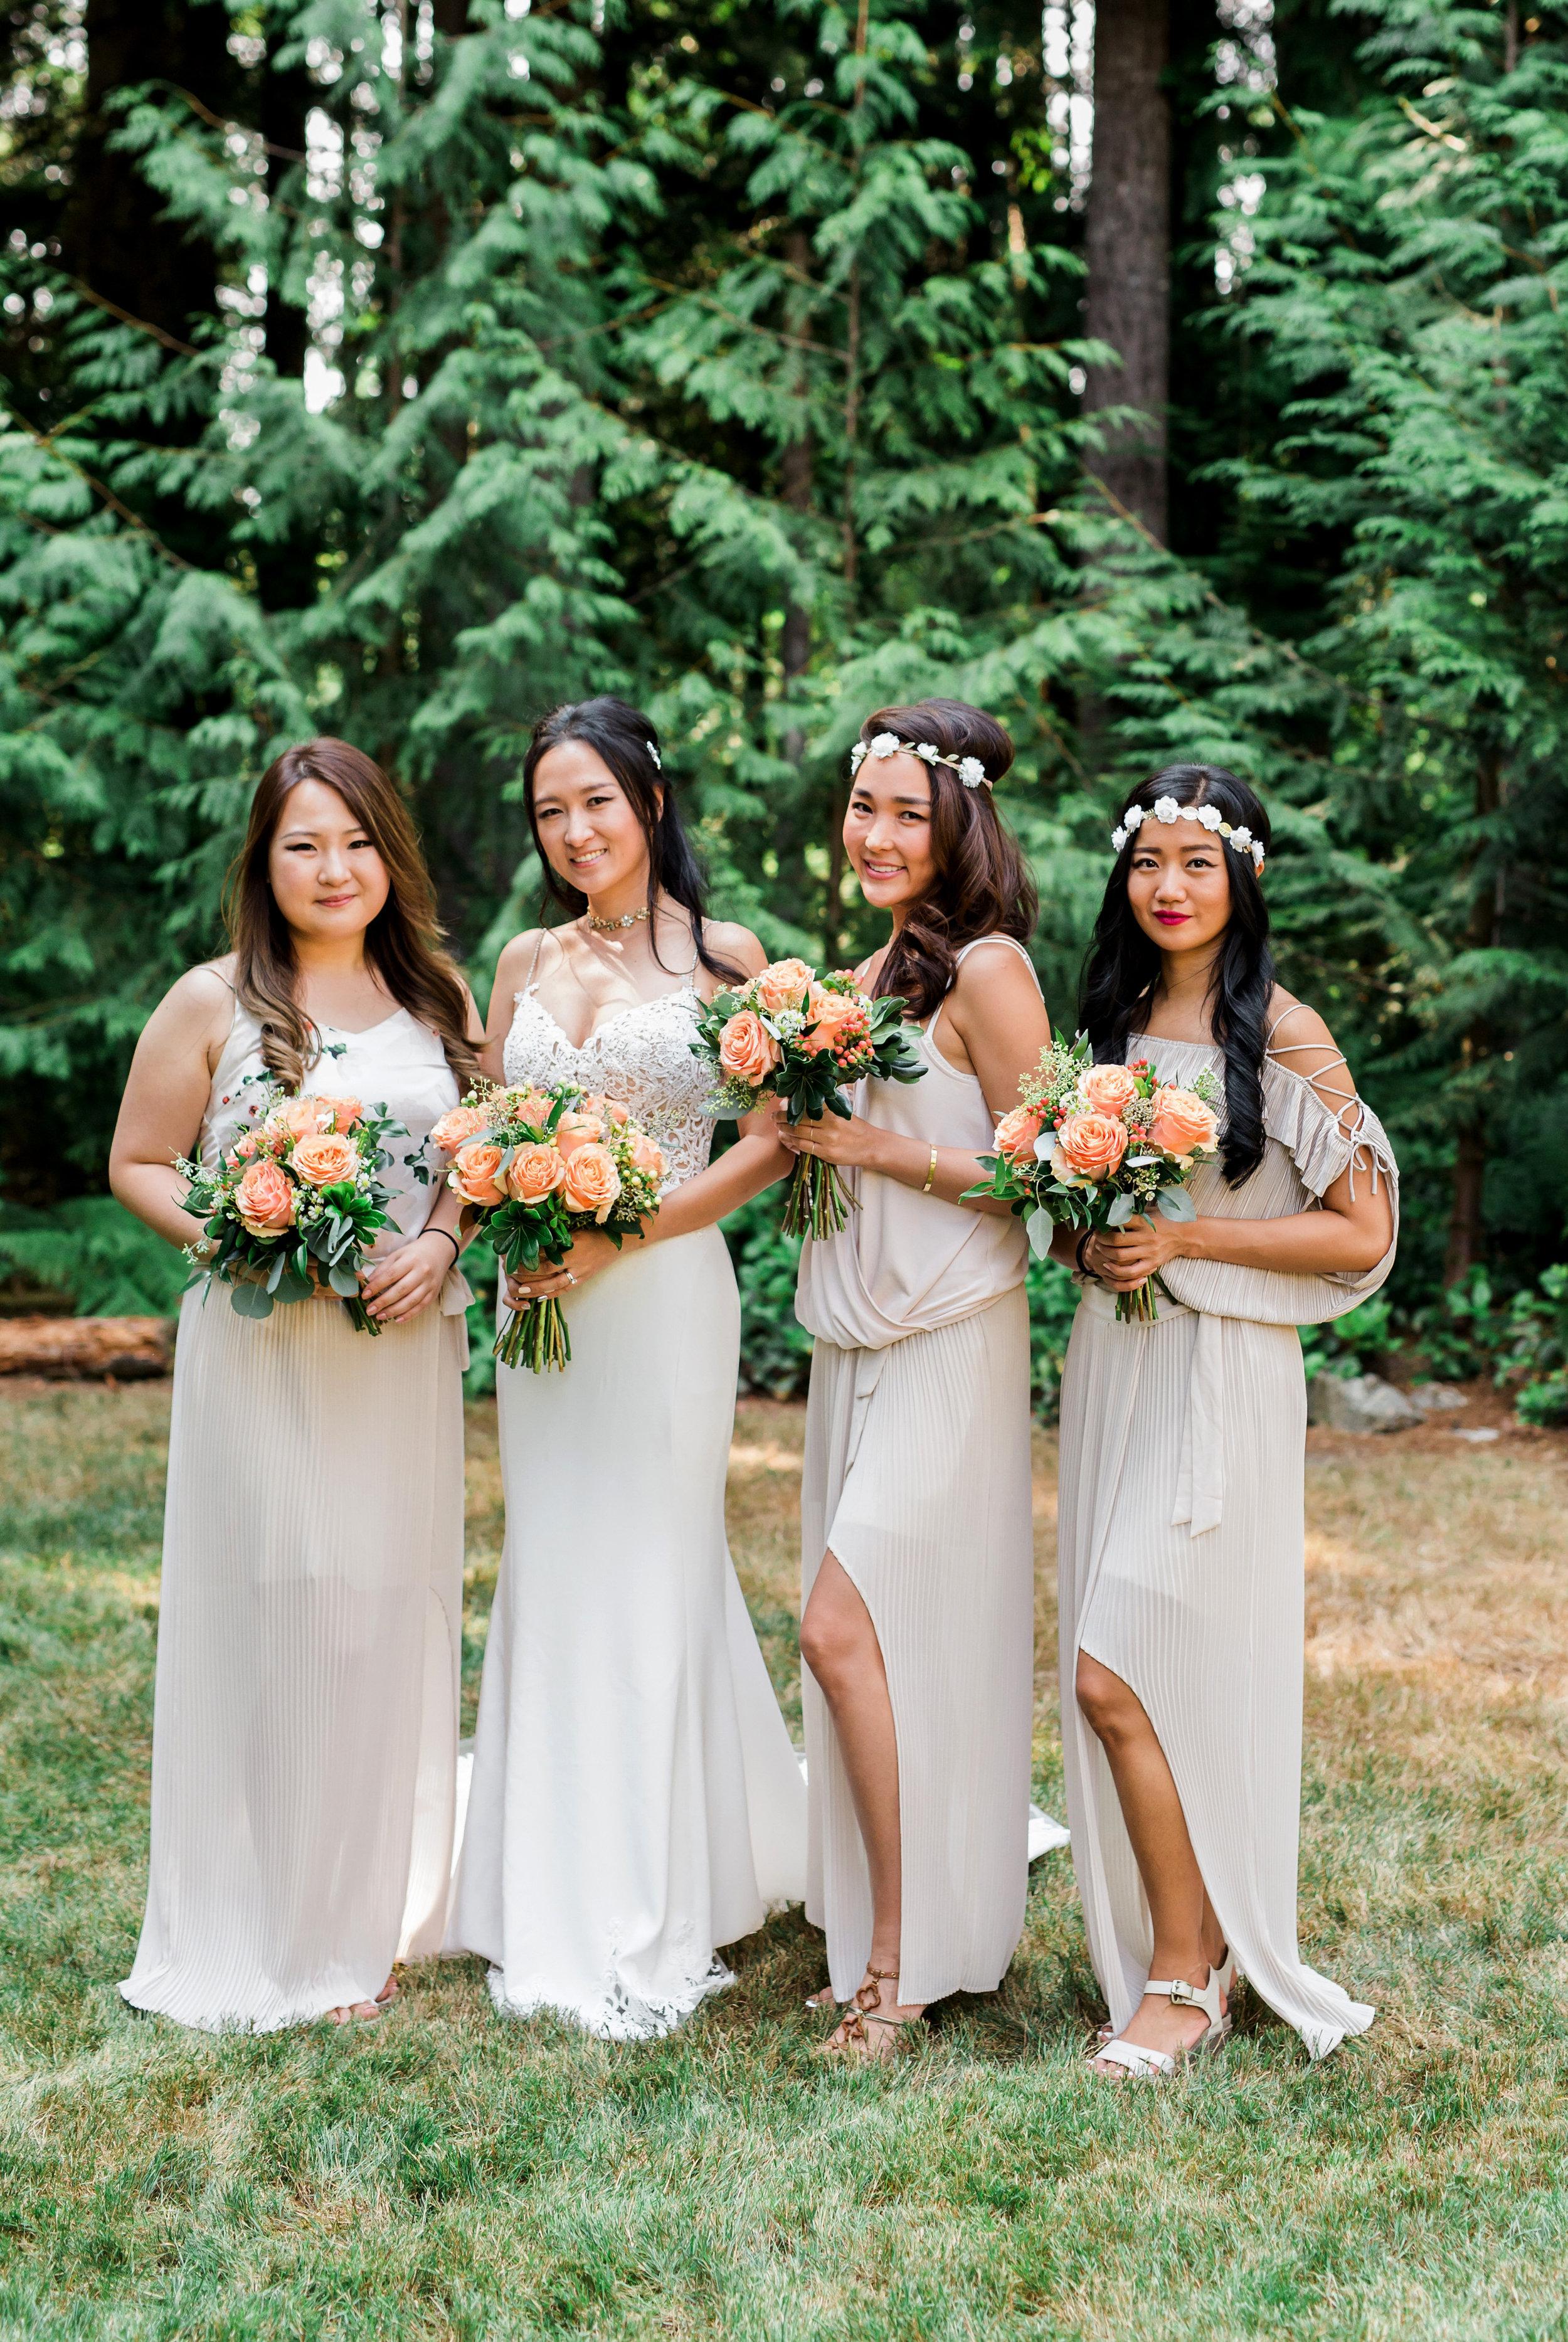 Linwood House Wedding Photos - Roberts Creek Wedding Photos - Vancouver Wedding Photographer & Videographer - Sunshine Coast Wedding Photos - Sunshine Coast Wedding Photographer - Jennifer Picard Photography - IMG_7160.jpg